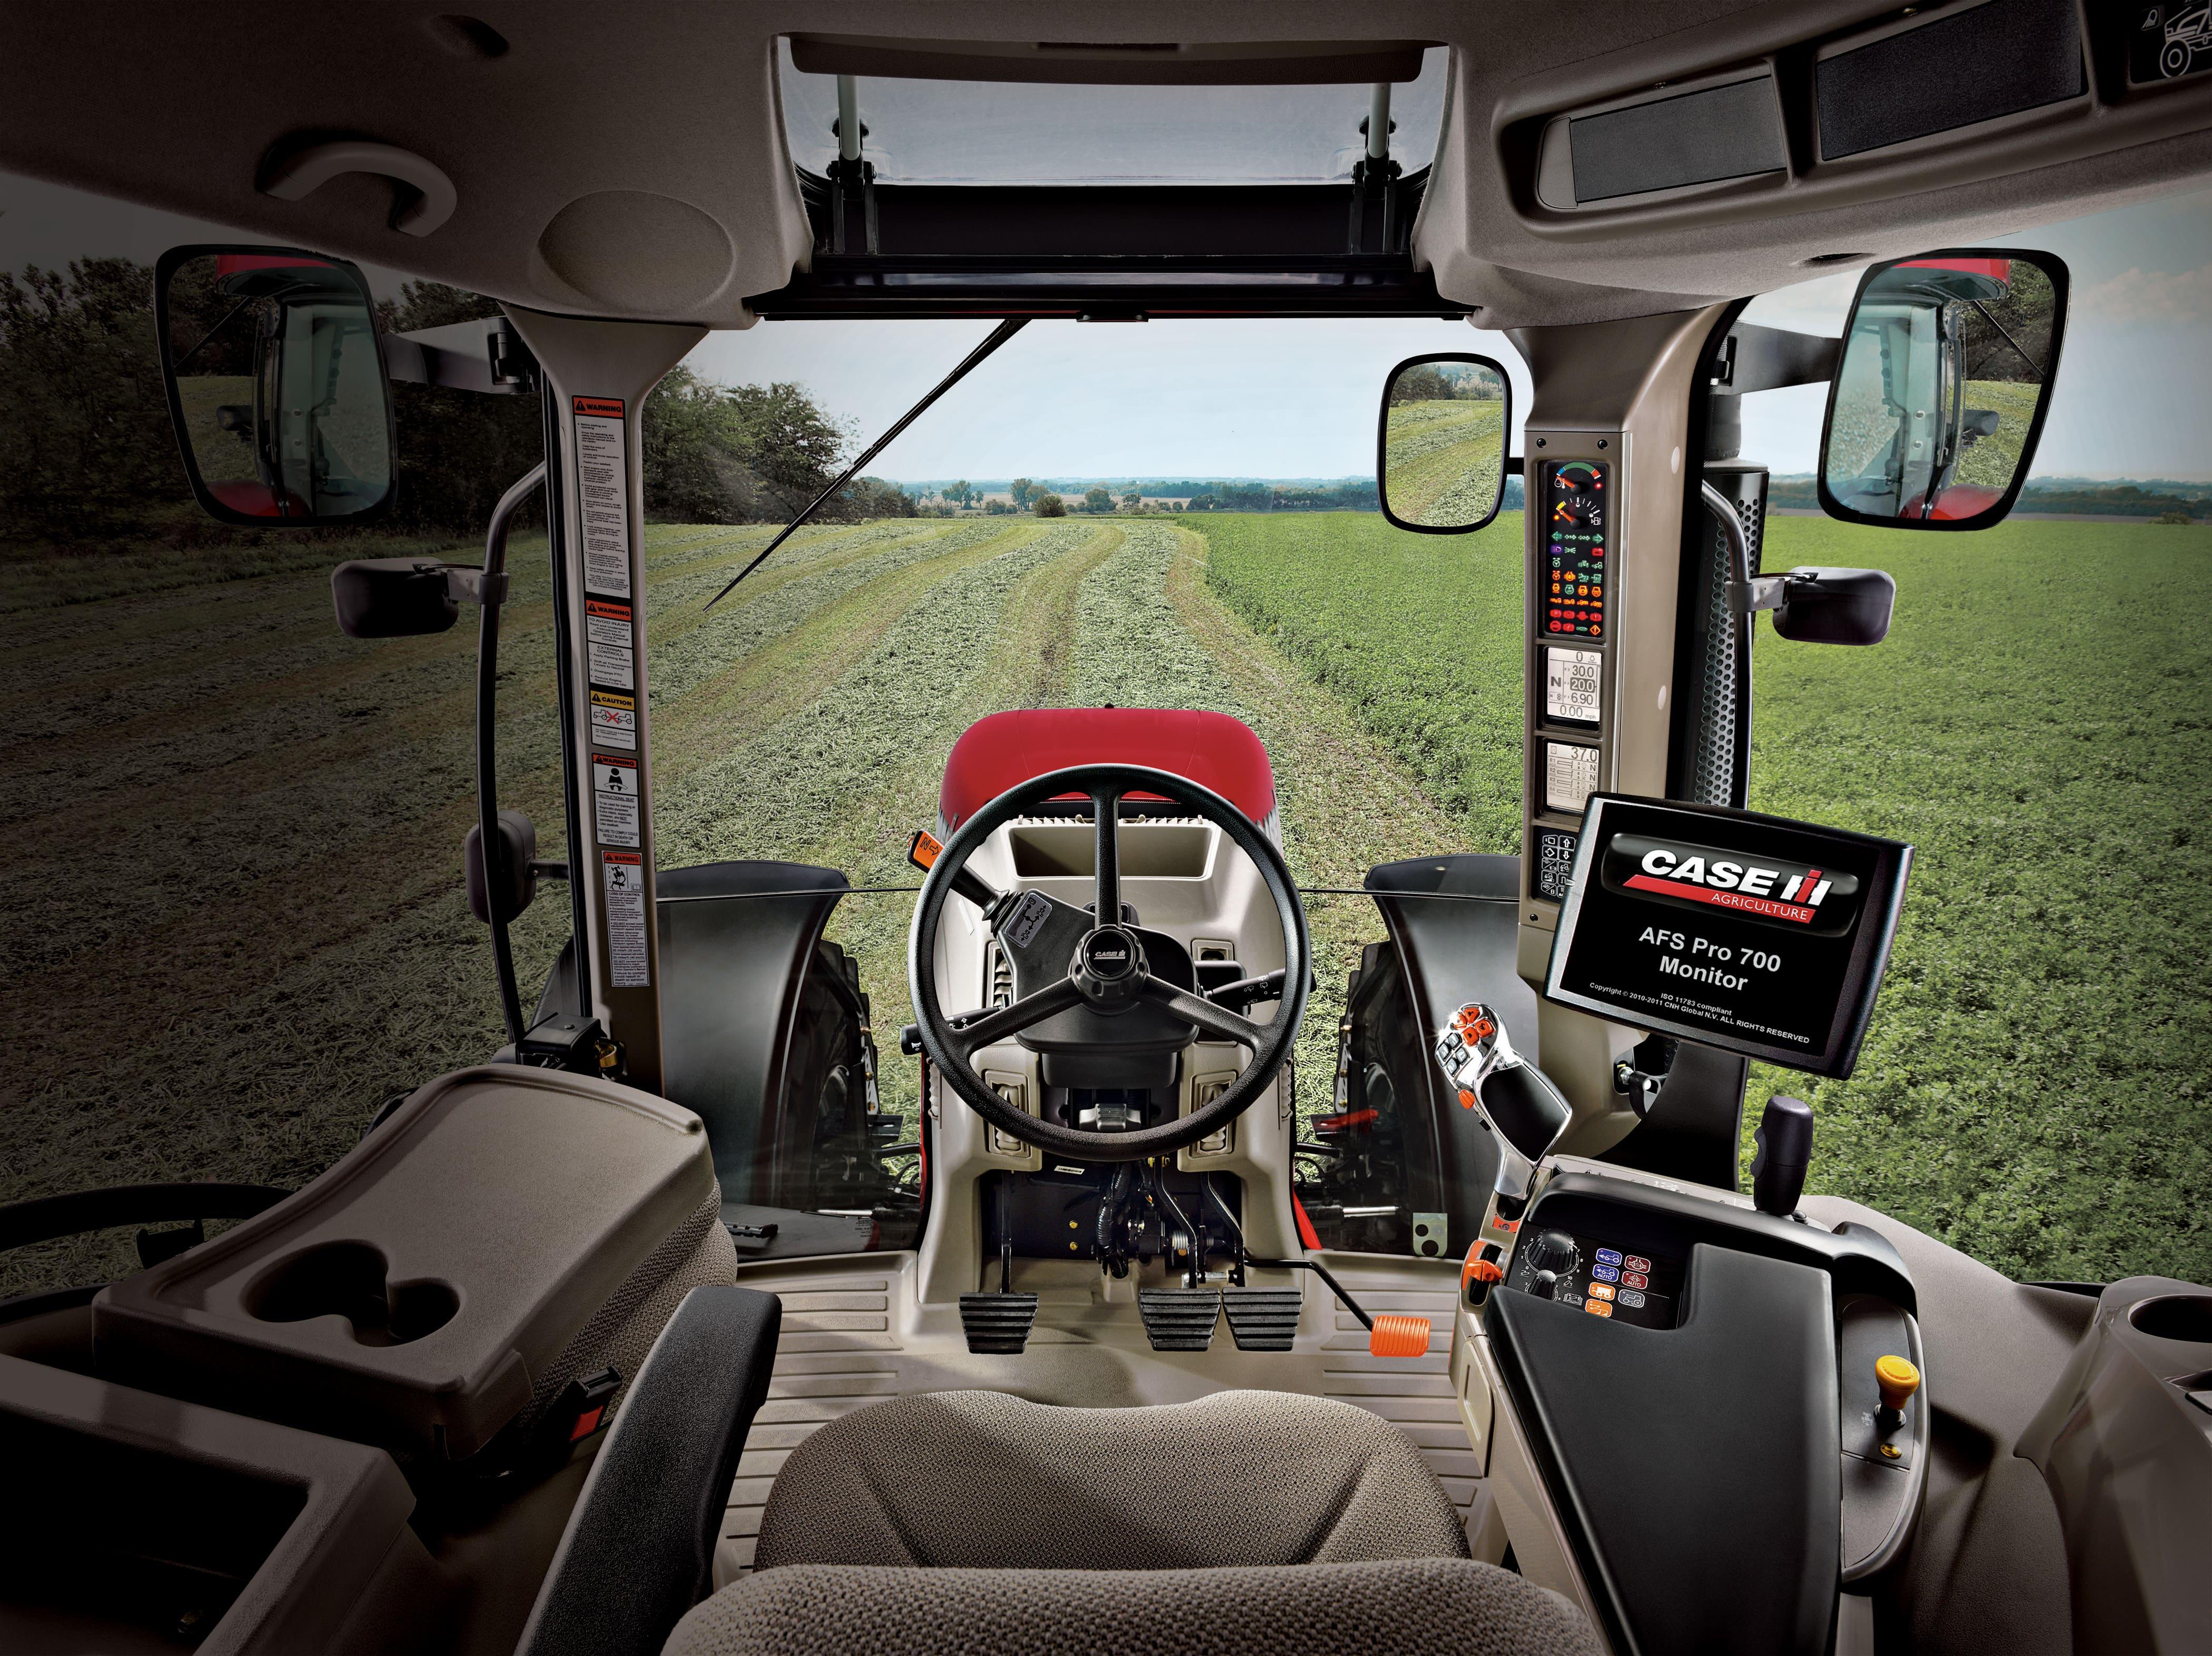 Case Ih 140 Puma Wiring Schematic Library Tractor 200 Midsize Row Crop Tractors